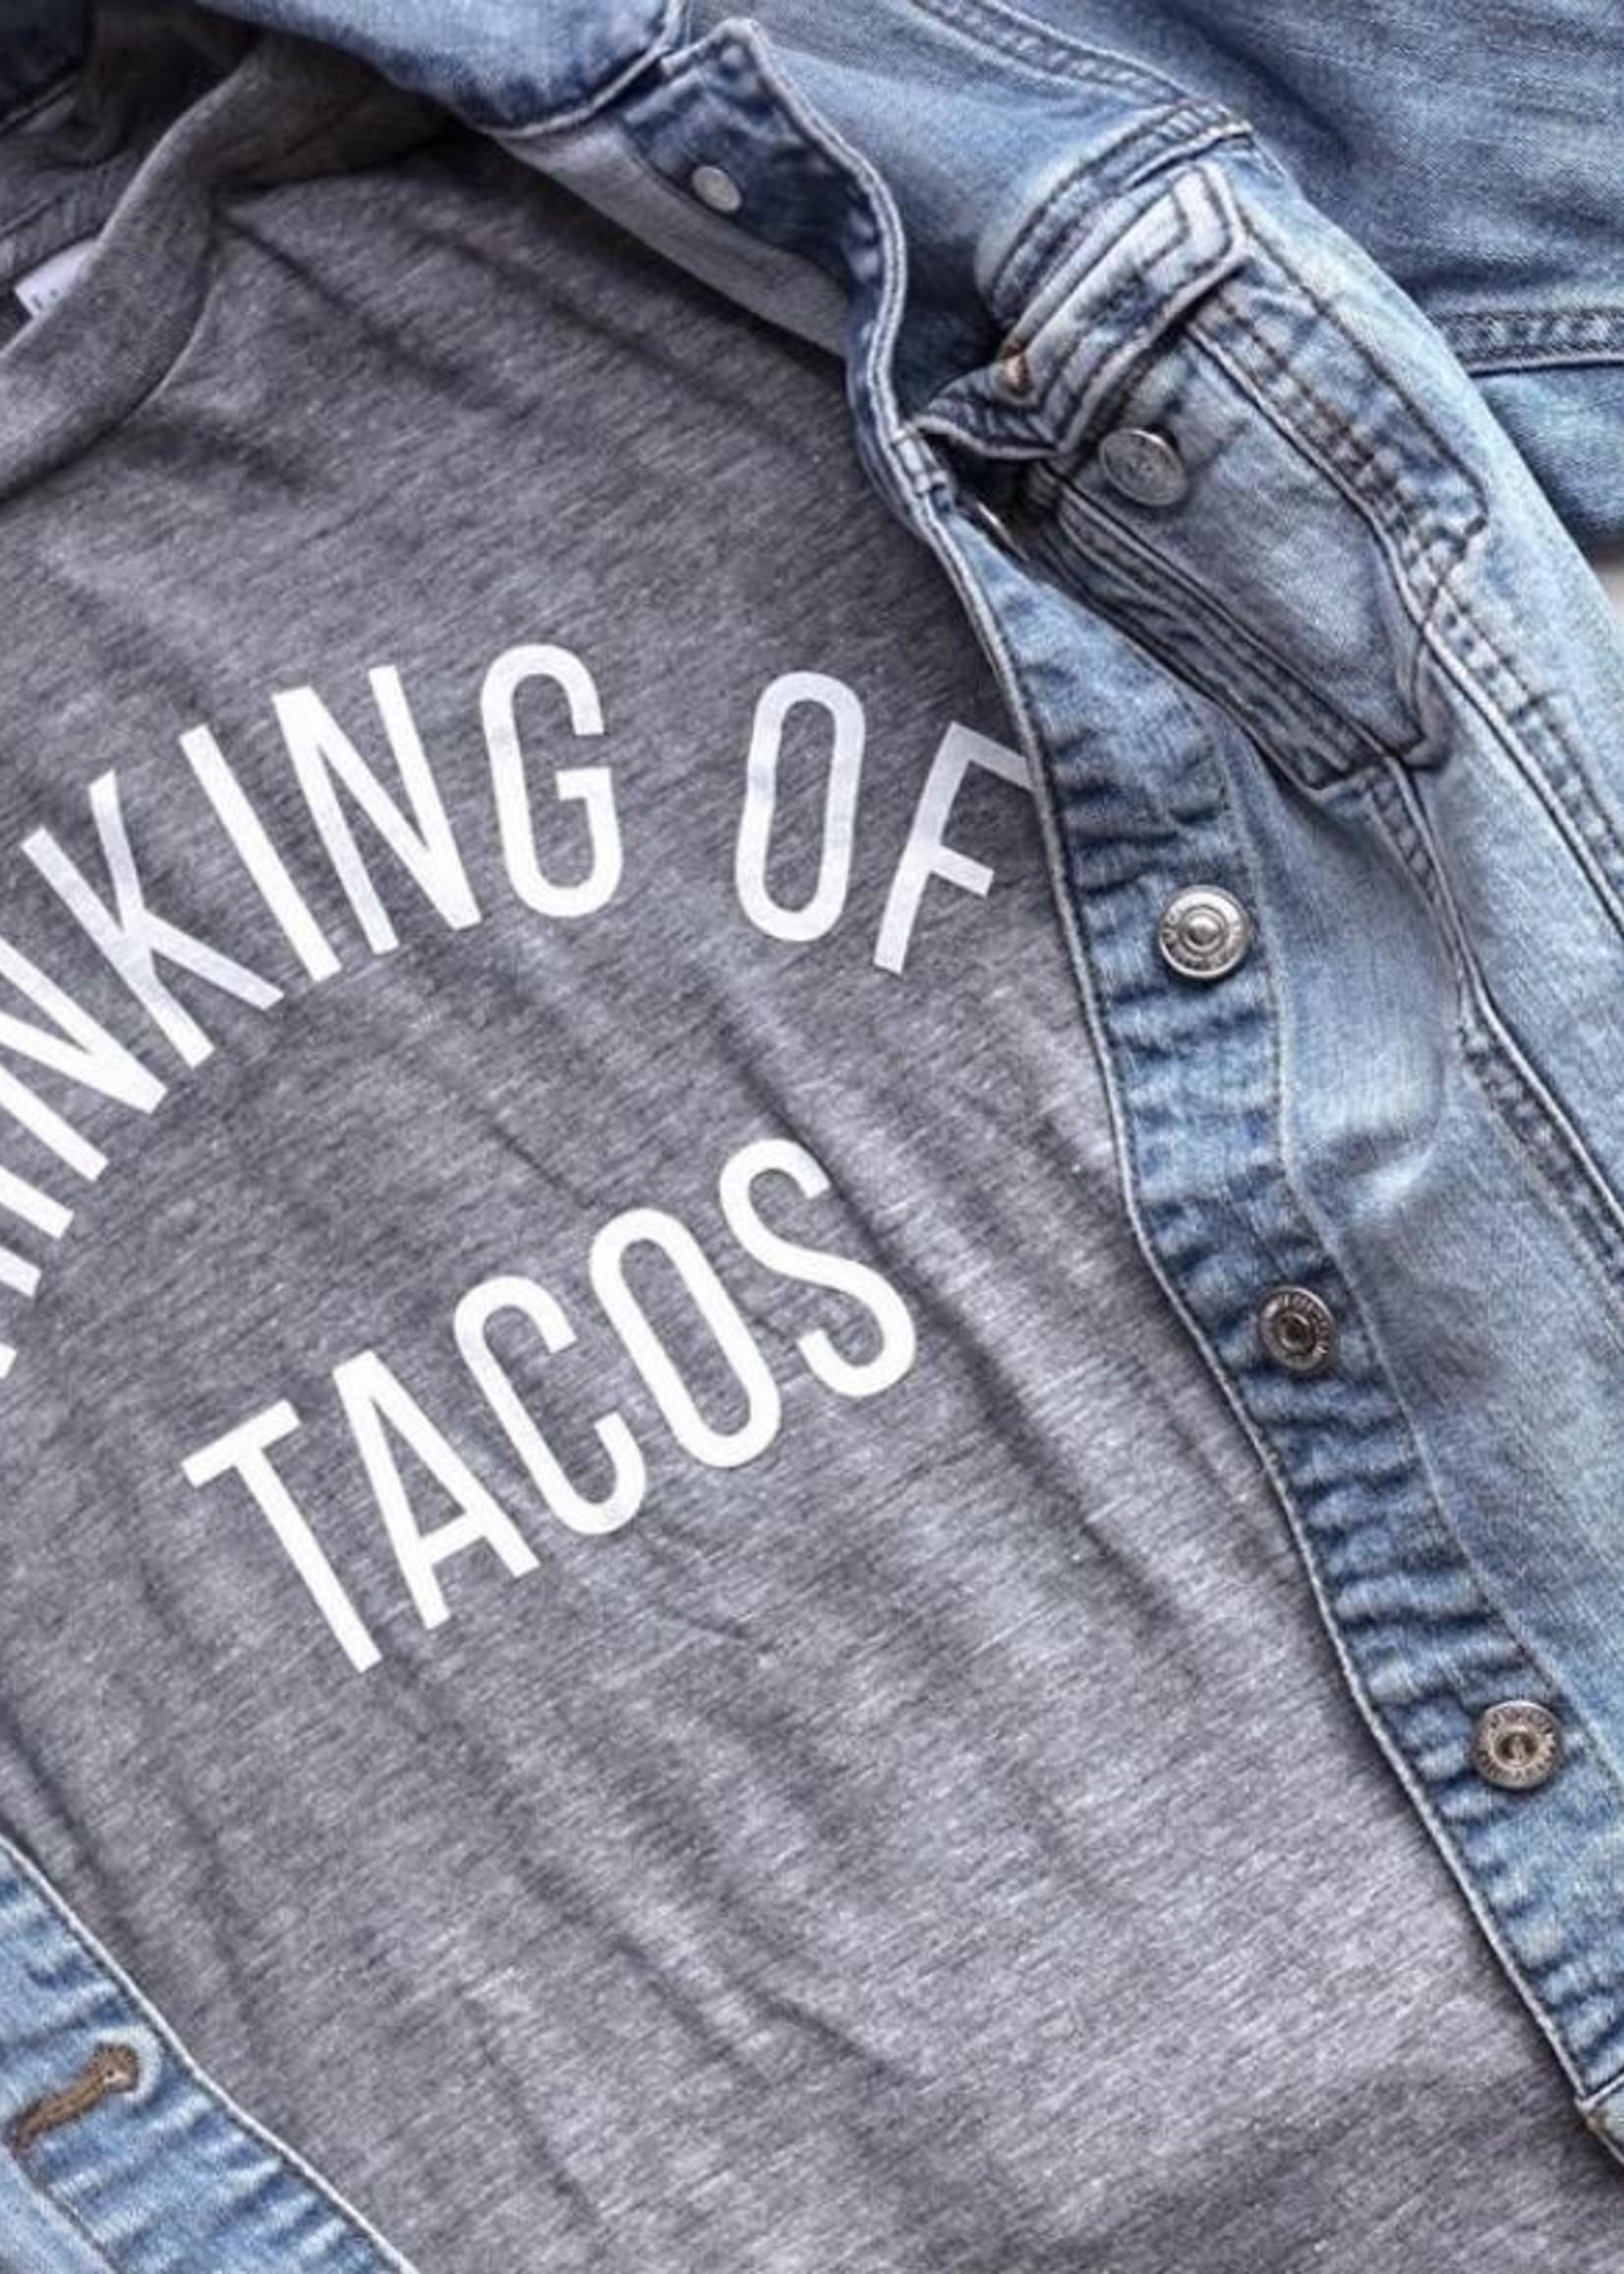 Little Bandidos Thinking of Tacos T-Shirt